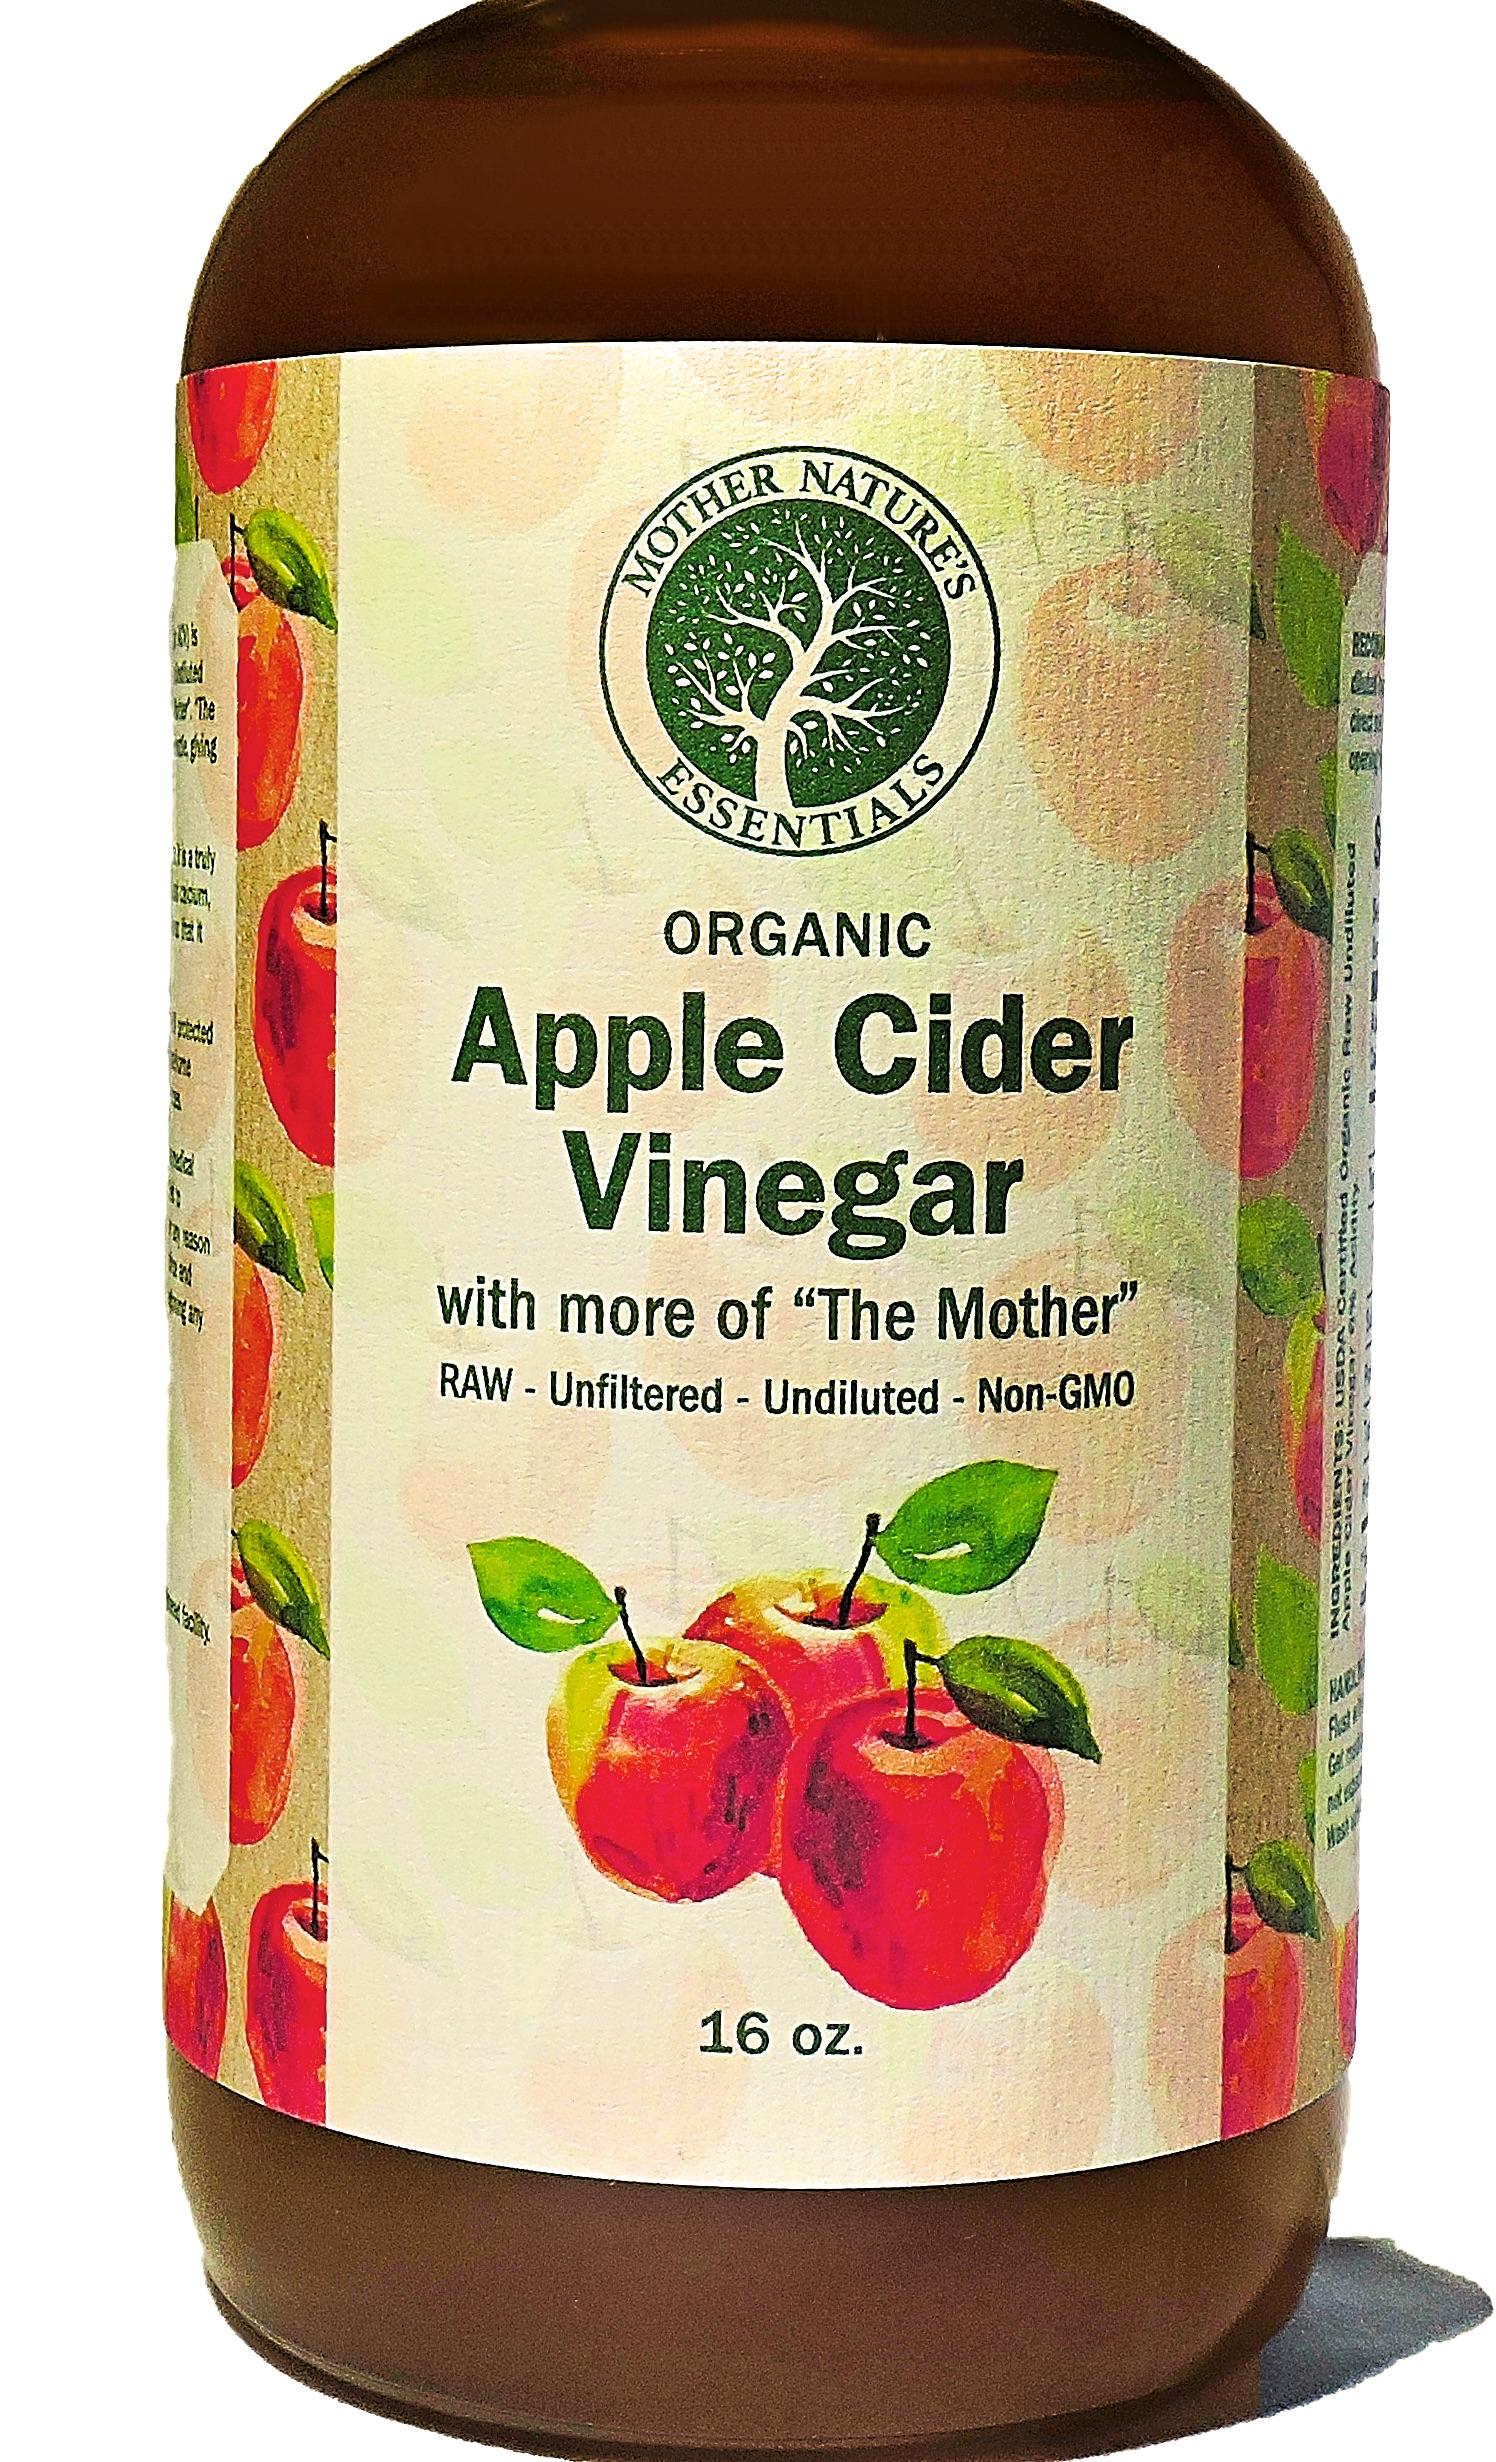 Apple Cider Vinegar, USDA Organic Raw, Unfiltered ...